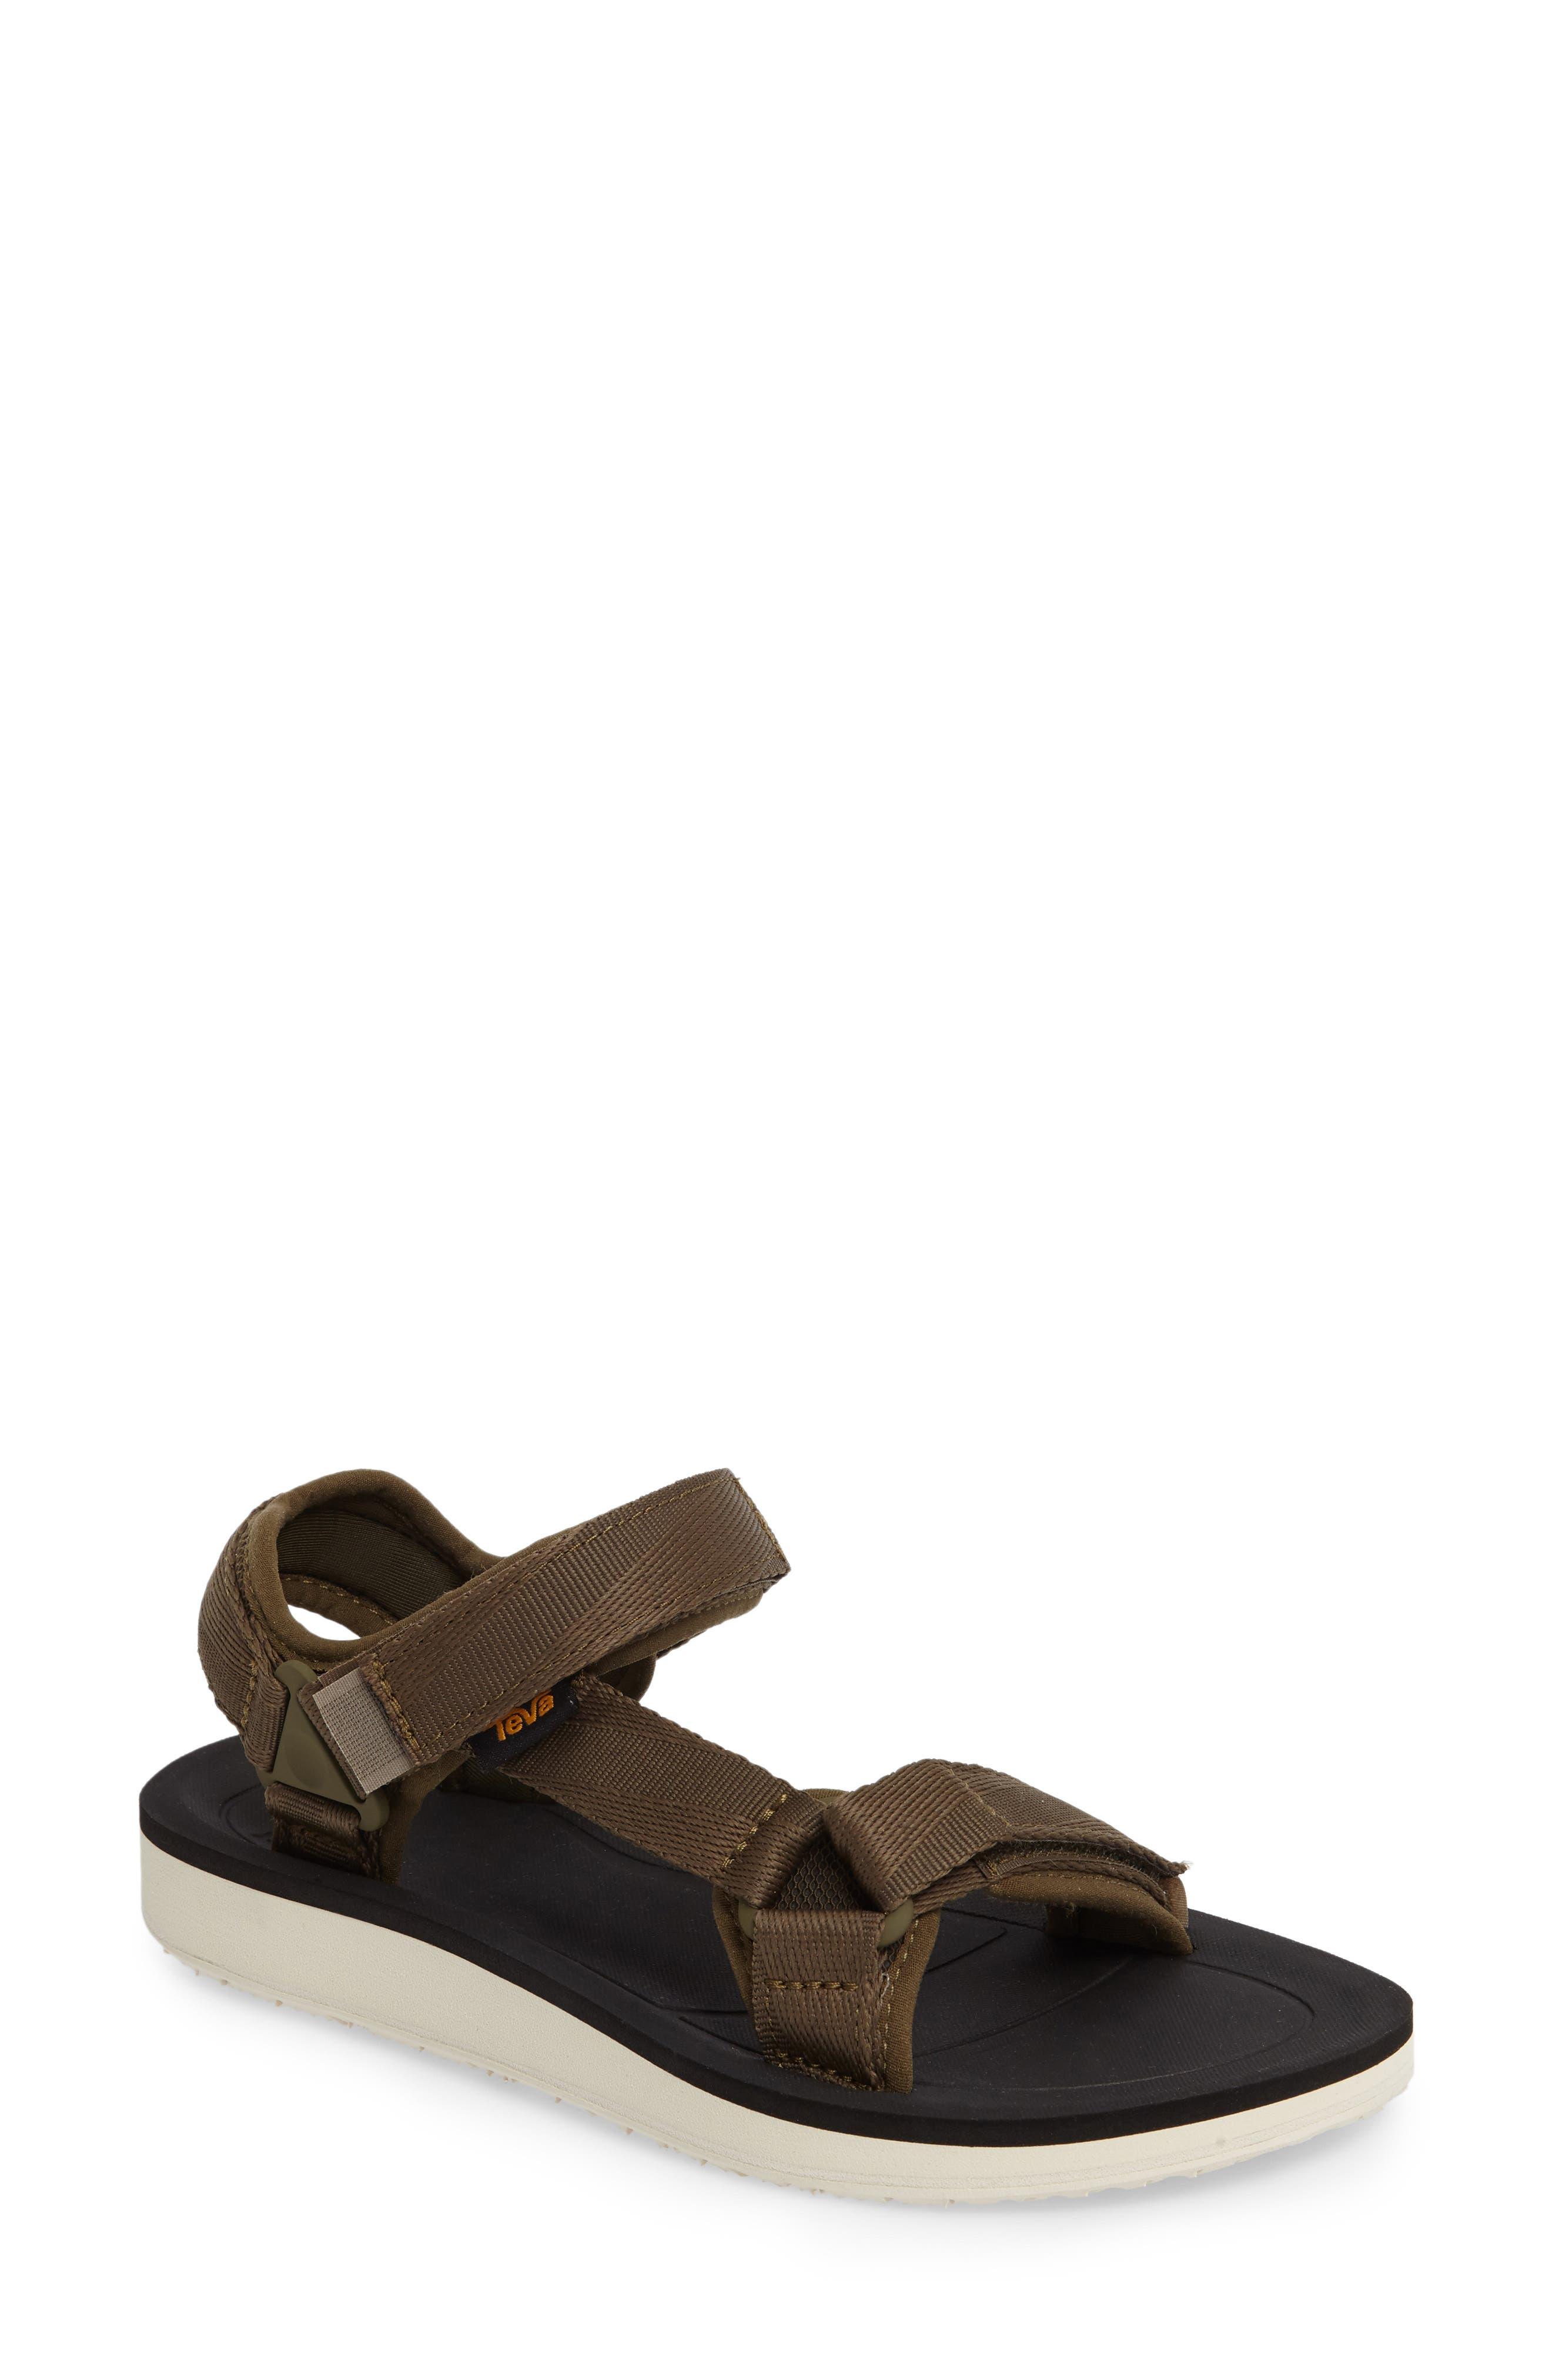 Original Universal Premier Sandal,                         Main,                         color, Olive Fabric